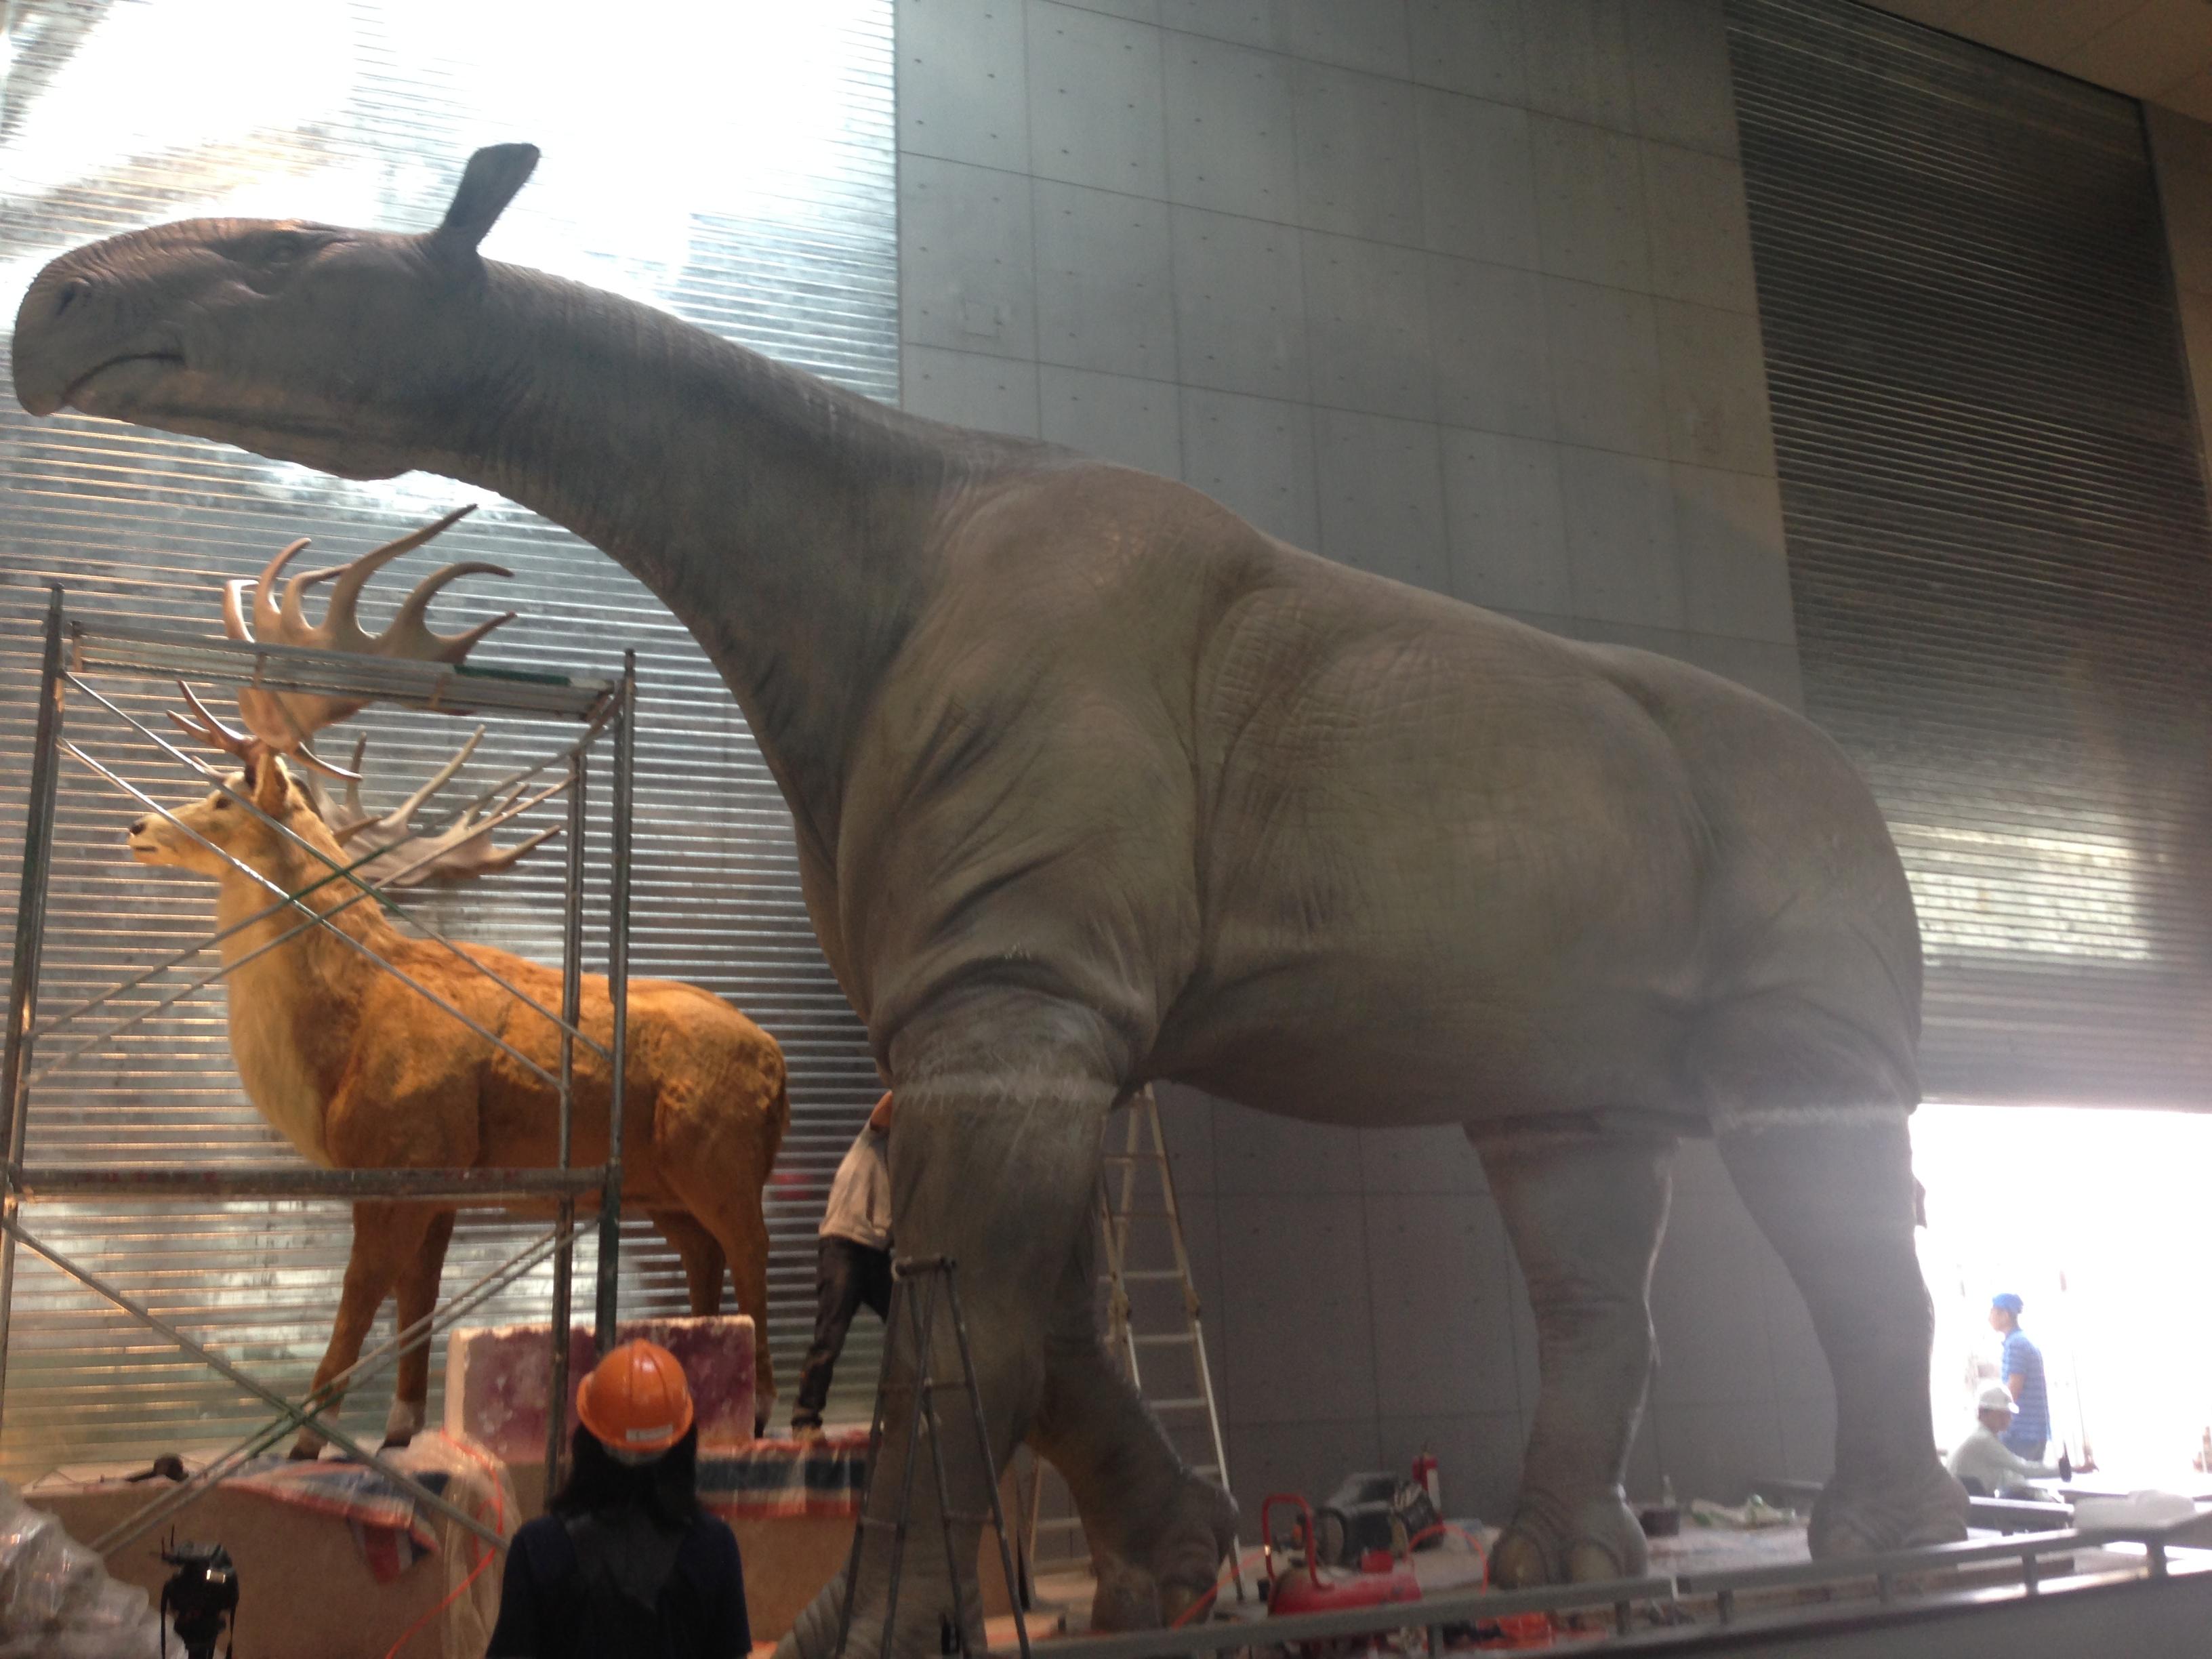 7.5m高巨犀雕塑